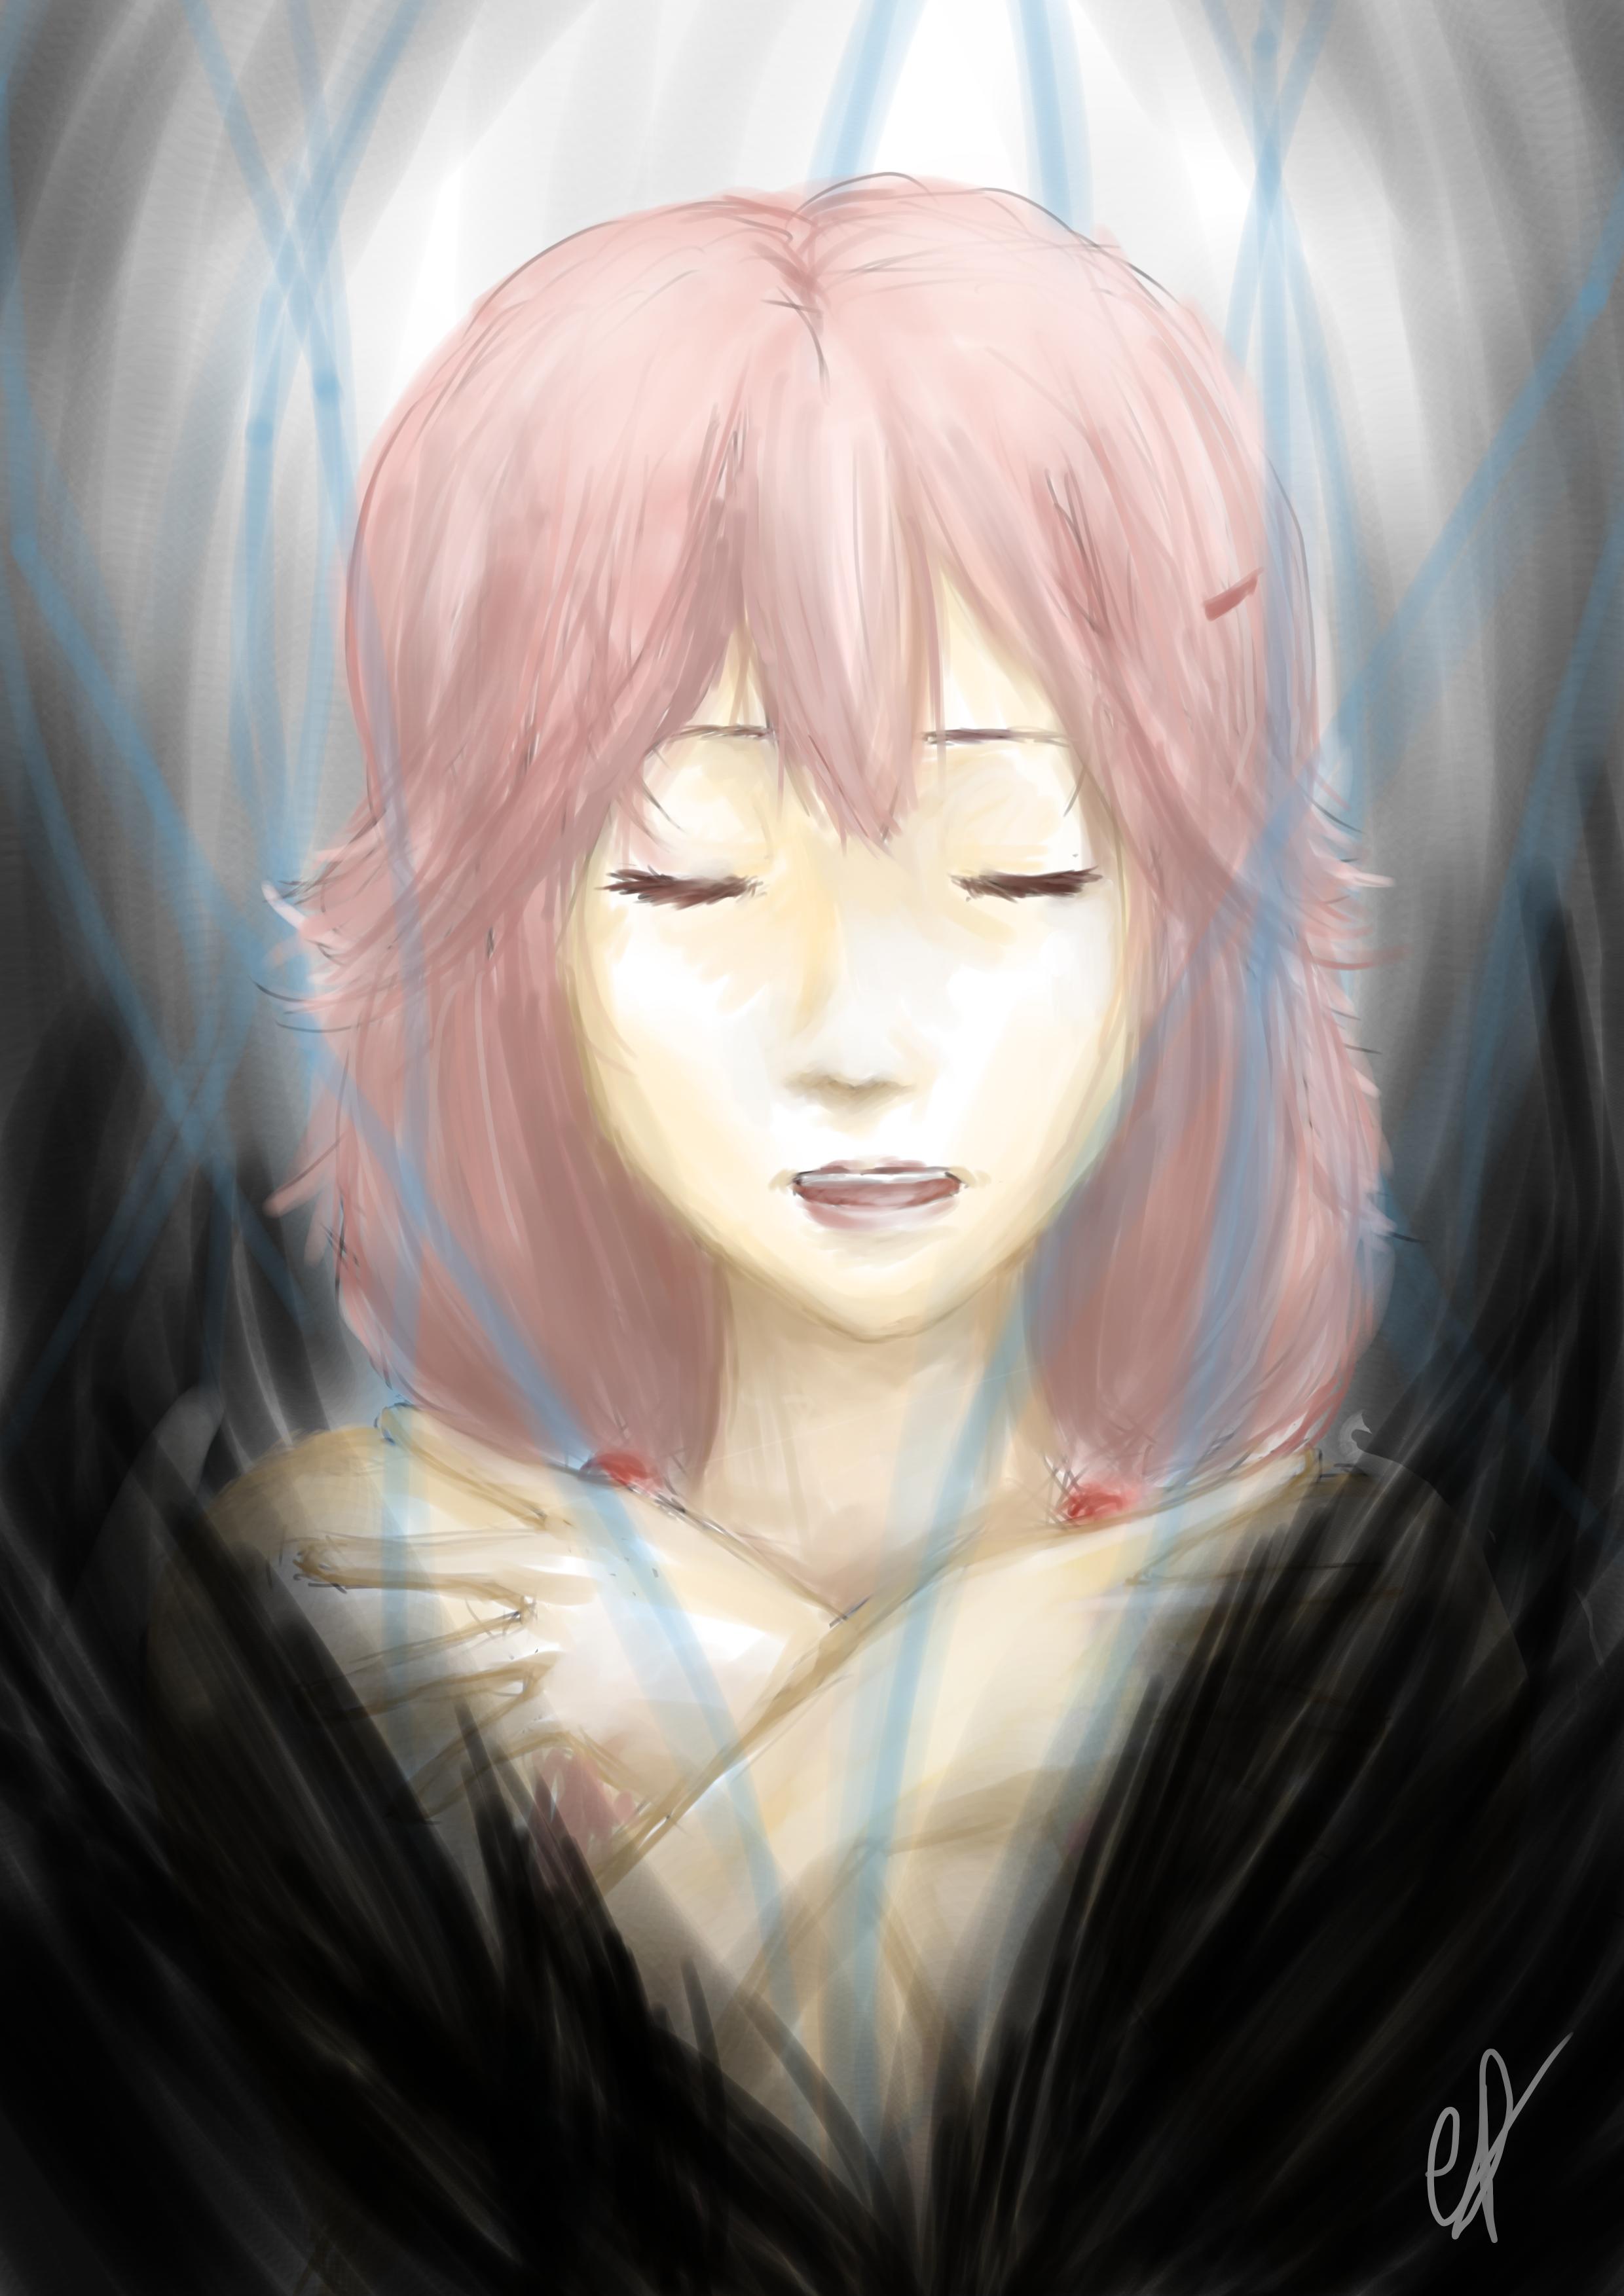 Void - Inori Yuzuriha fan art